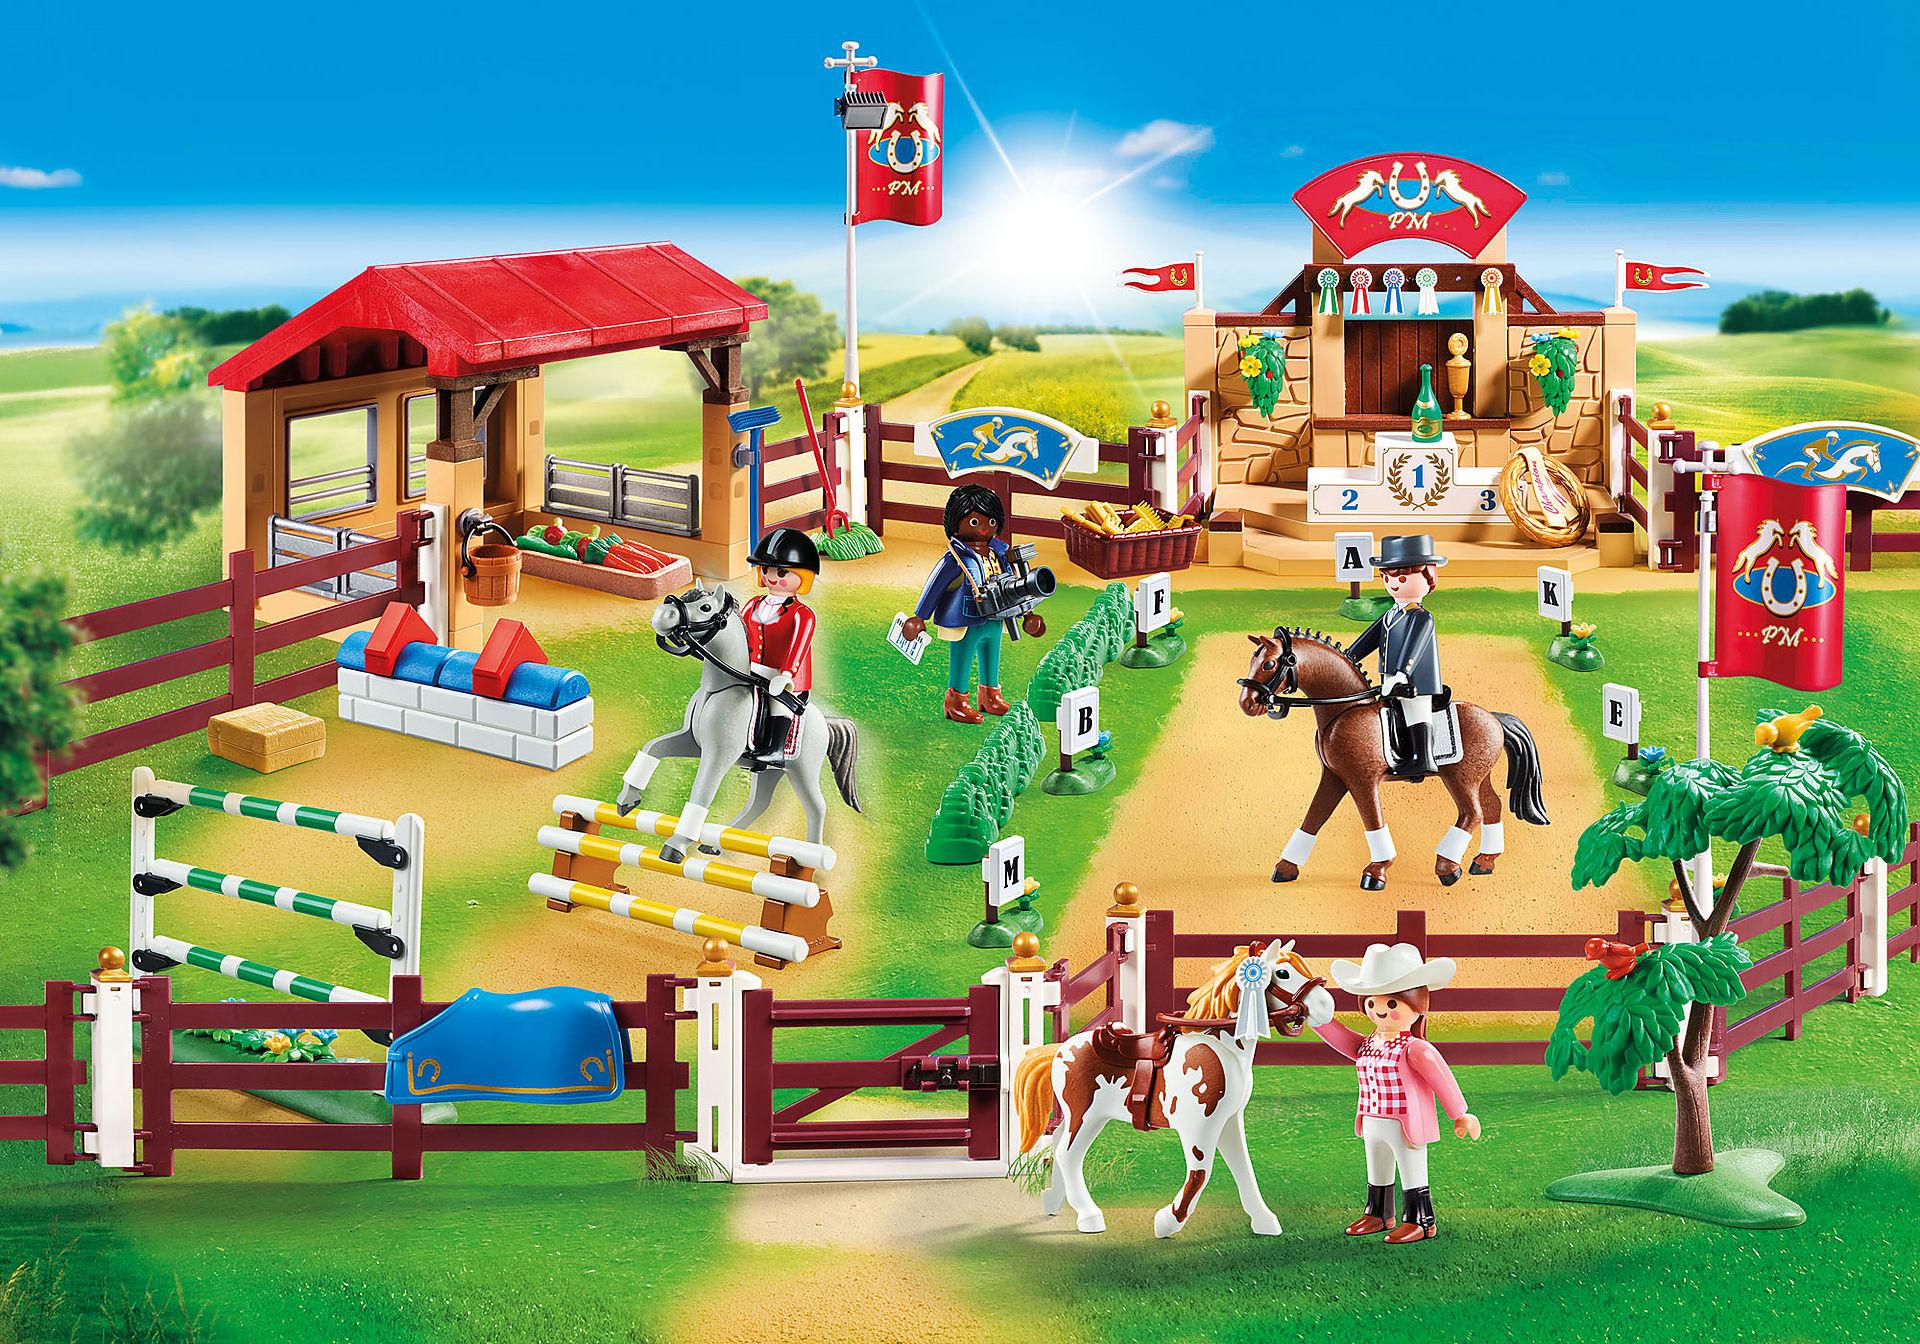 70337 Grande Torneio Equestre zoom image1